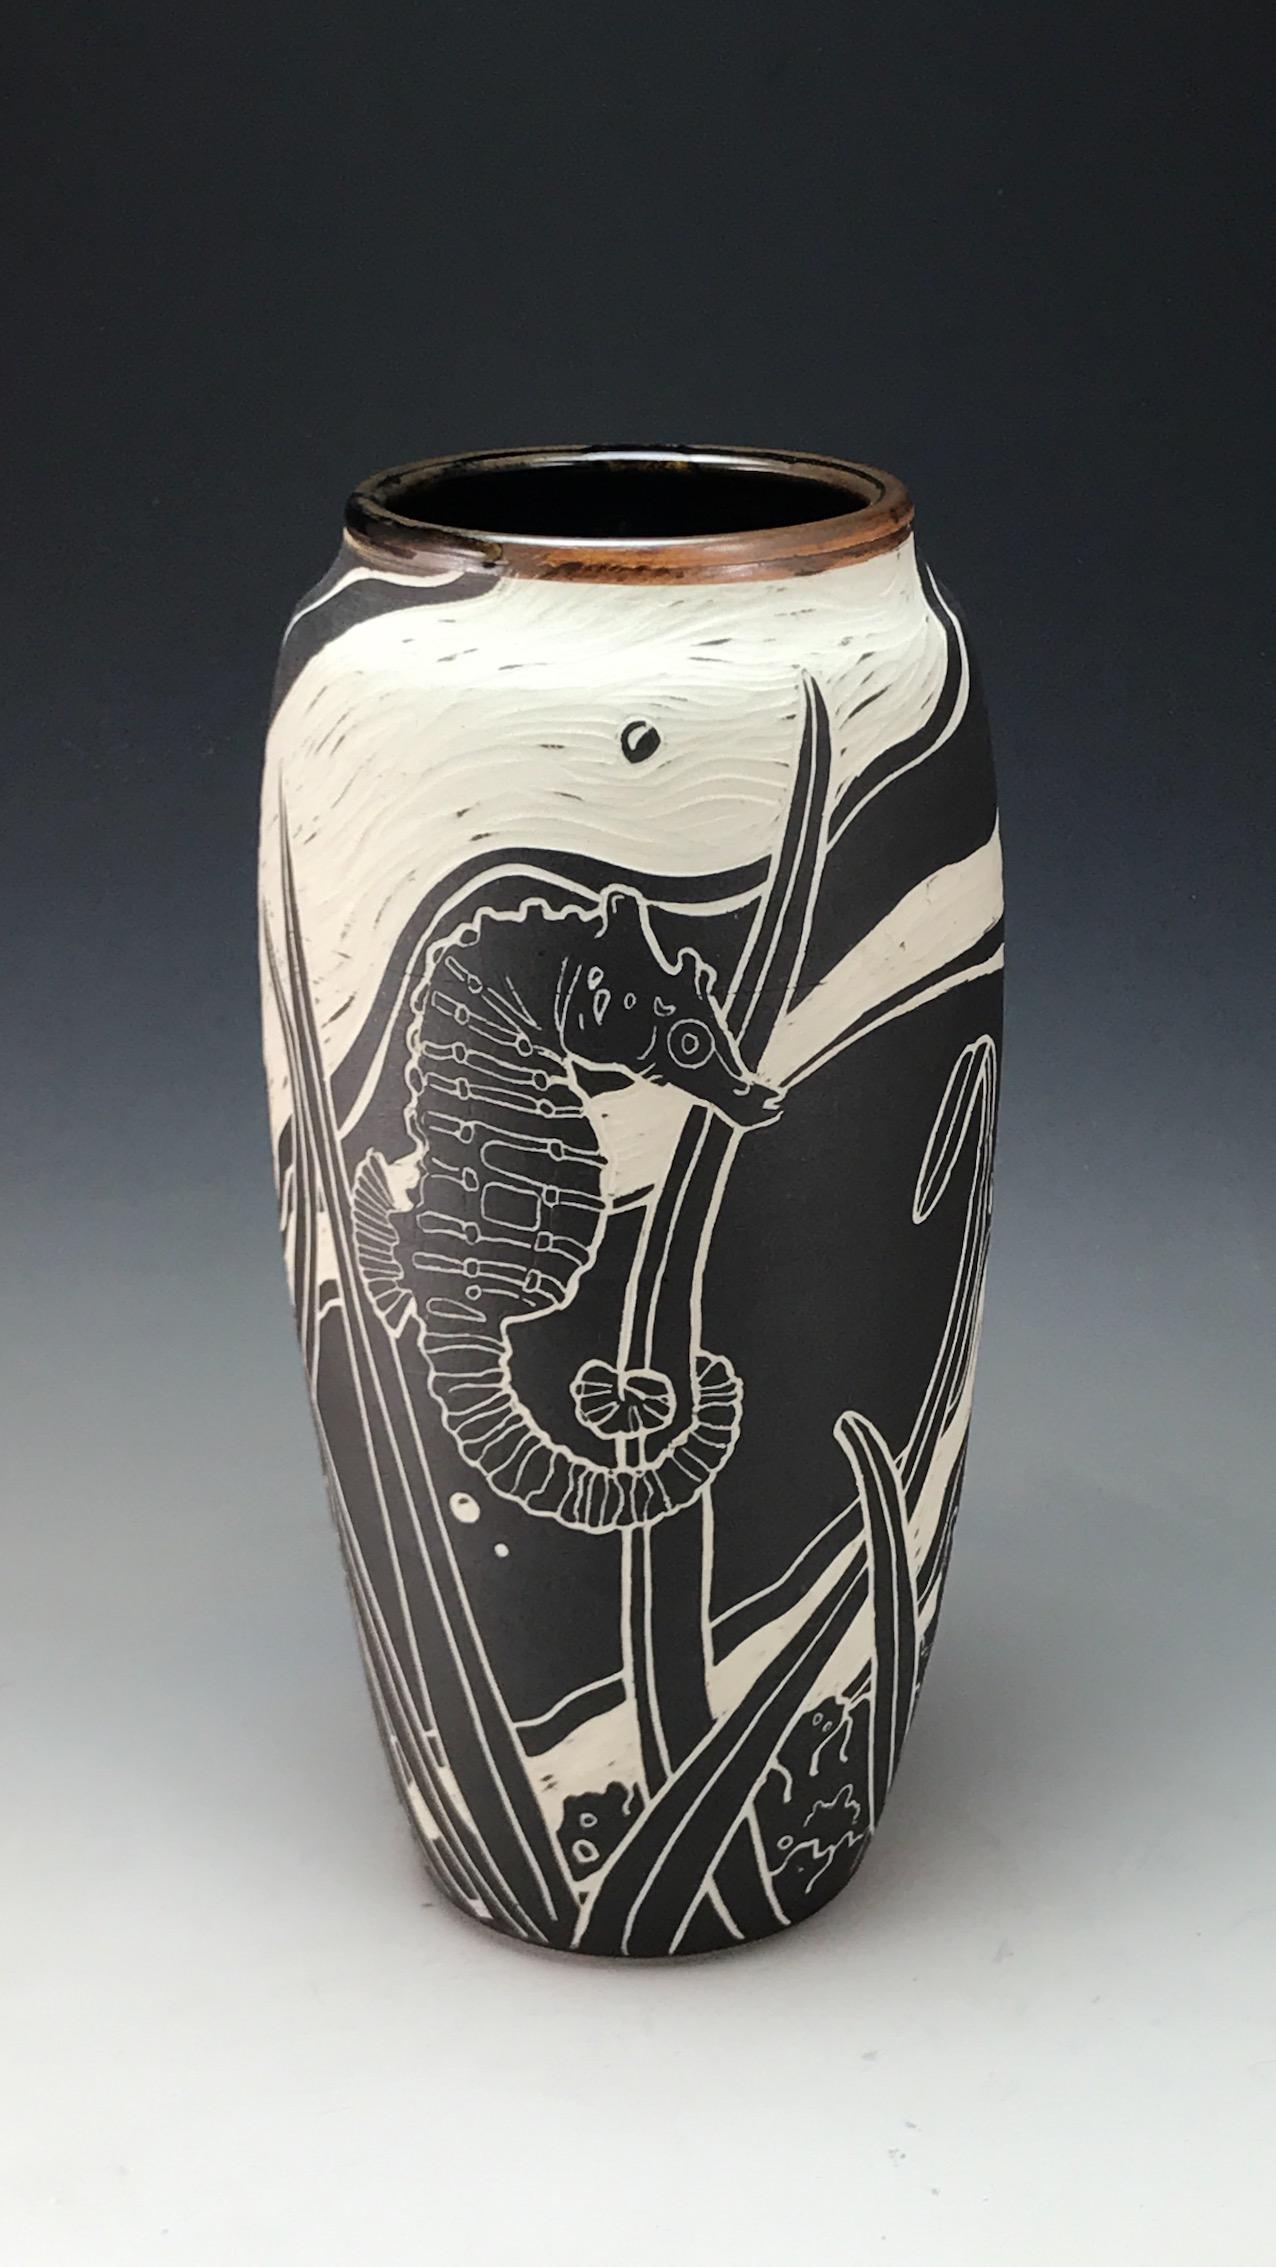 Seahorse sgraffito Vase